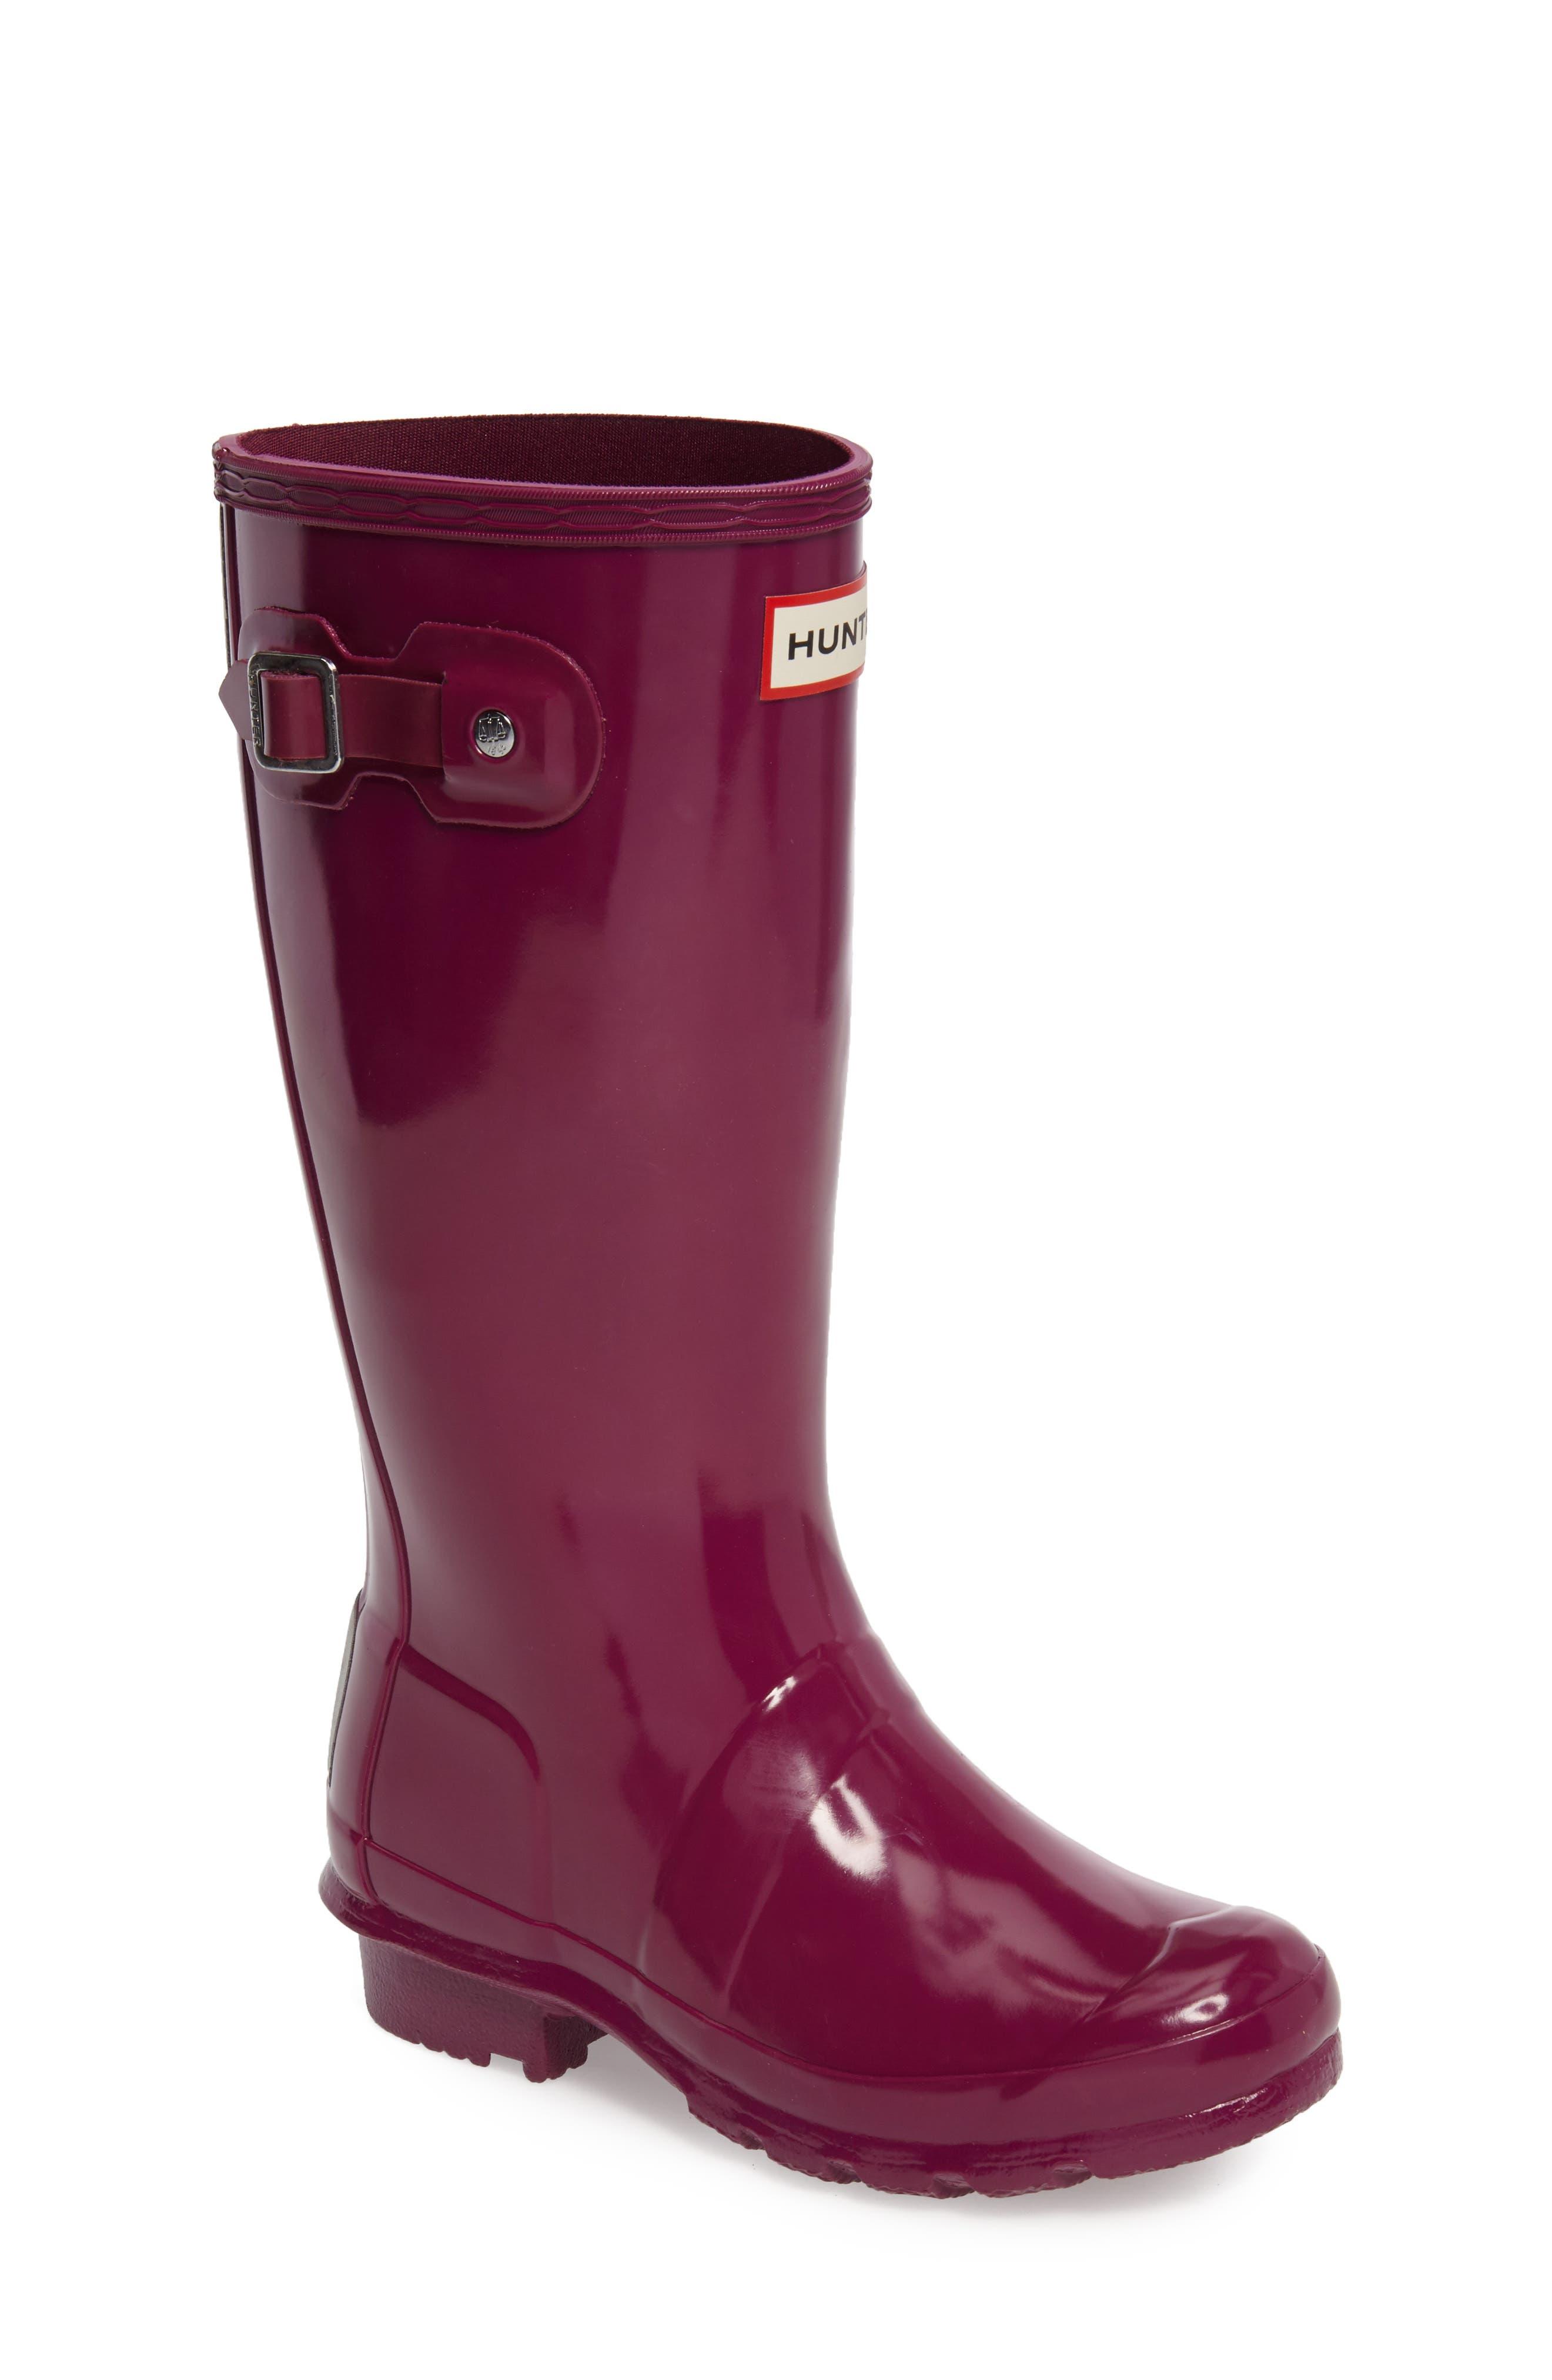 Main Image - Hunter 'Original Gloss' Rain Boot (Little Kid & Big Kid)